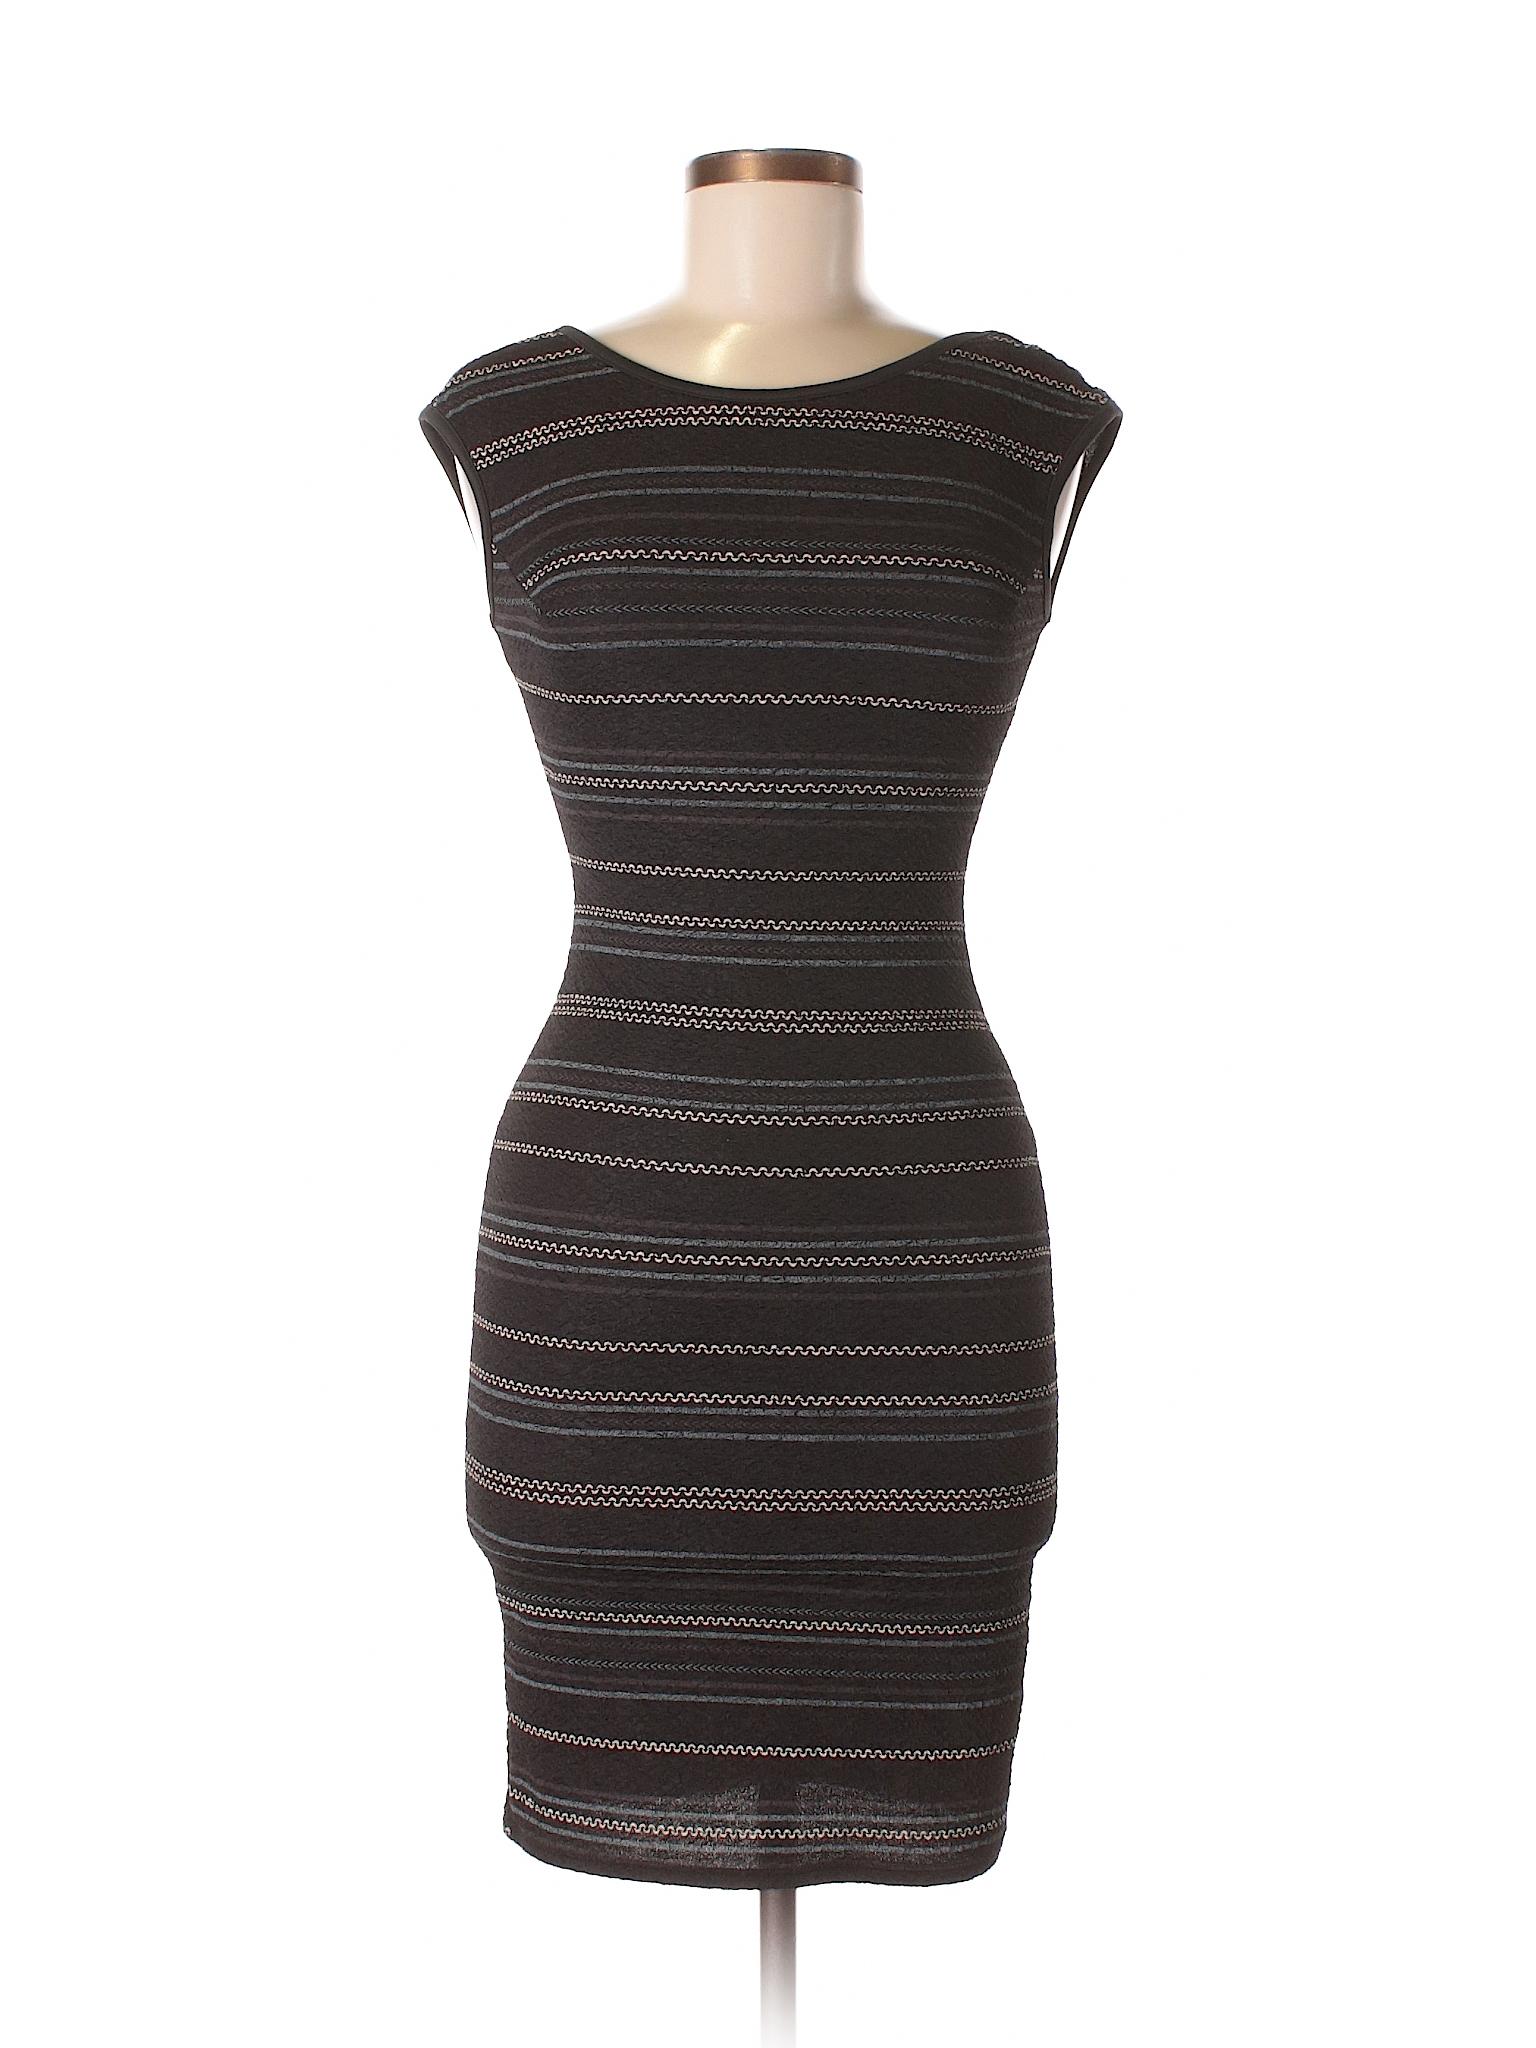 Boutique winter Windsor Windsor Dress Casual Dress winter Boutique Casual Twwg6qd